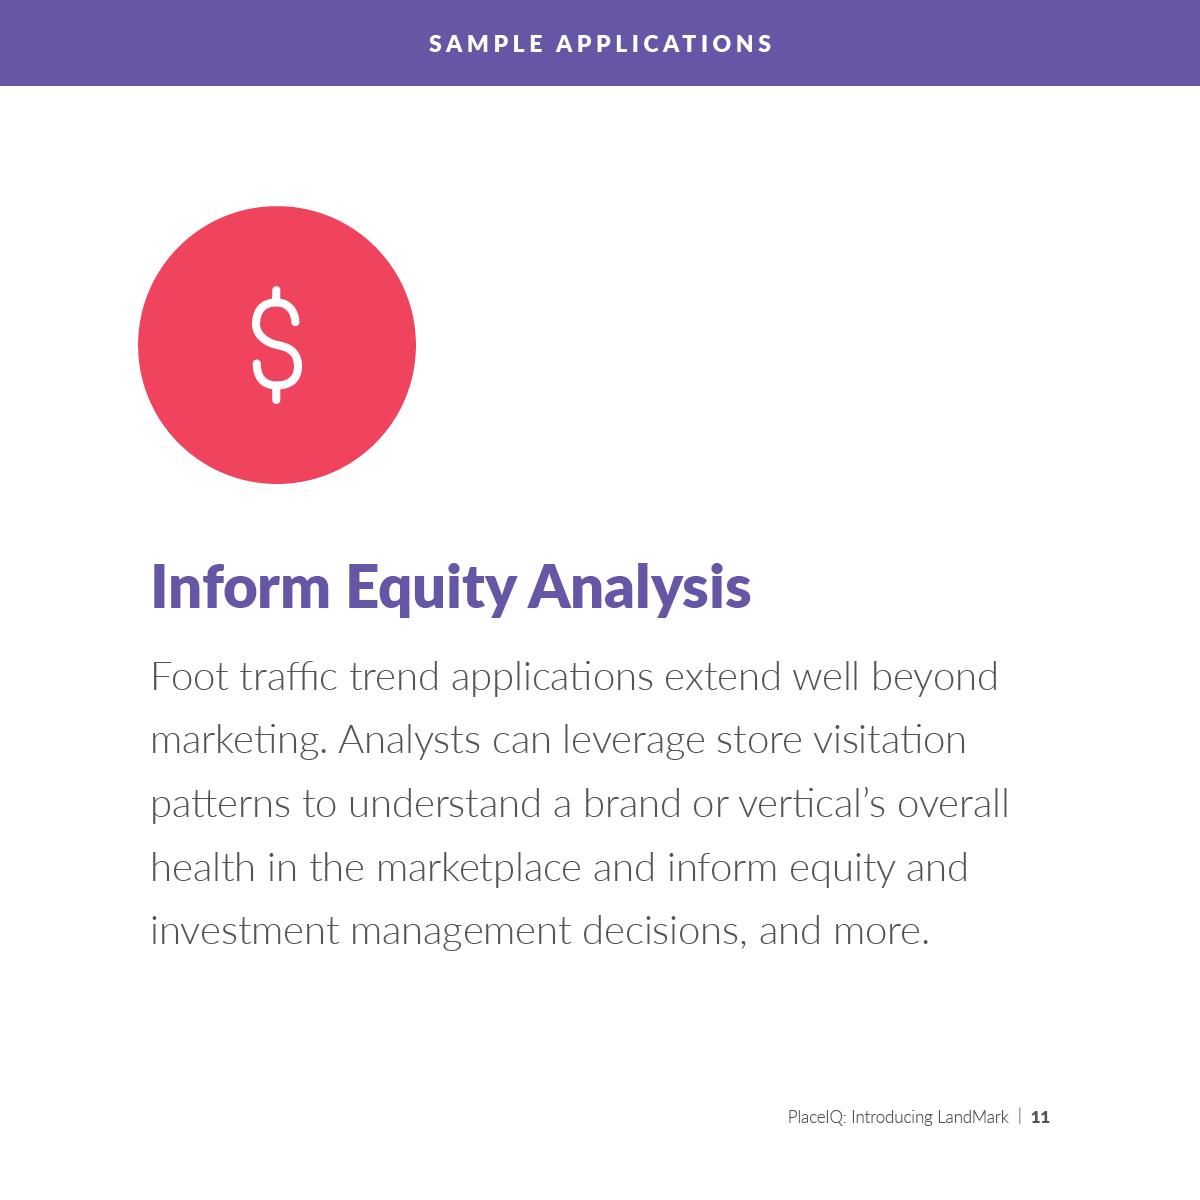 Inform Equity Analysis